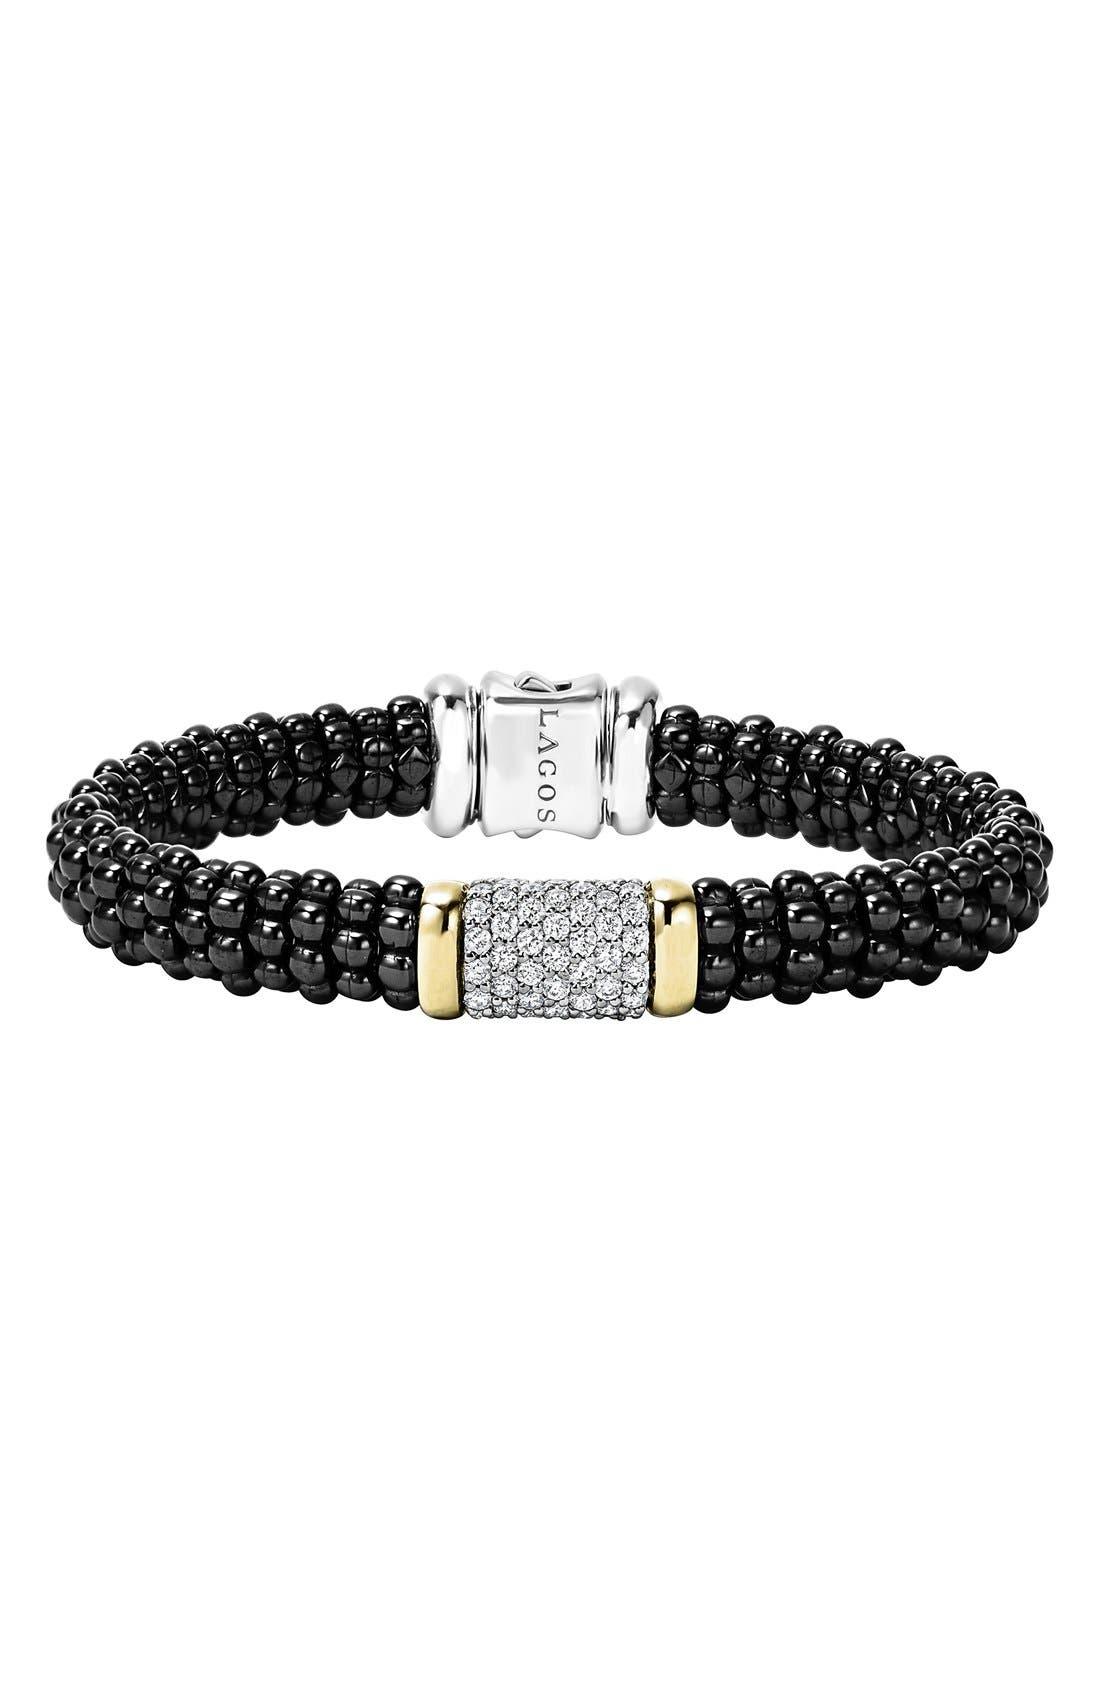 Black Caviar Diamond Pavé Rope Bracelet,                             Main thumbnail 1, color,                             BLACK CAVIAR/ GOLD